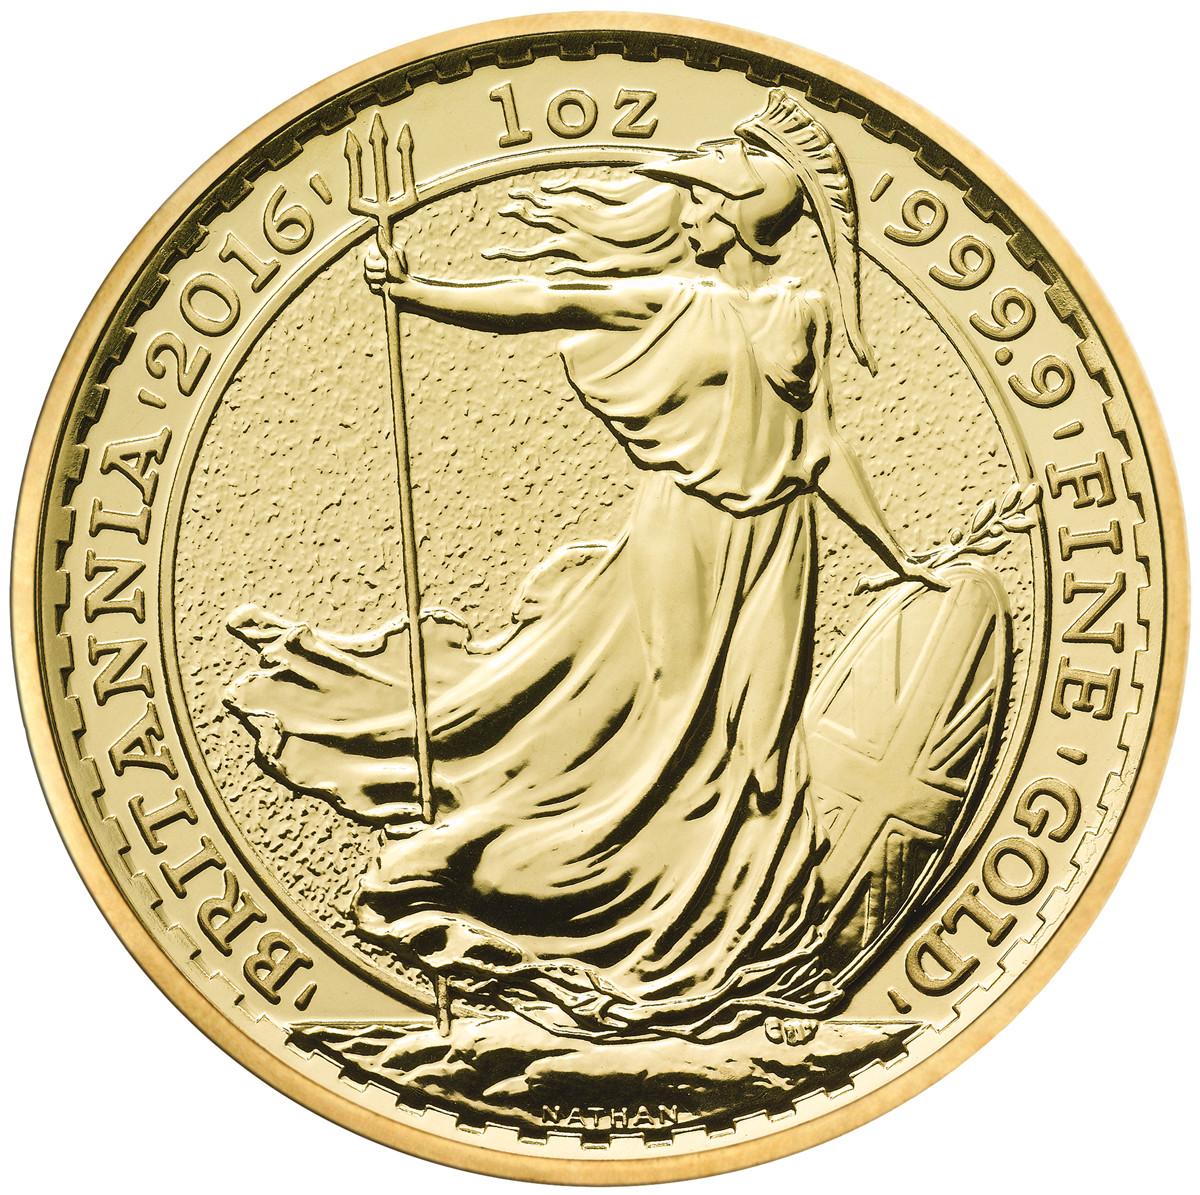 2016 Britannia One Ounce Gold Coin